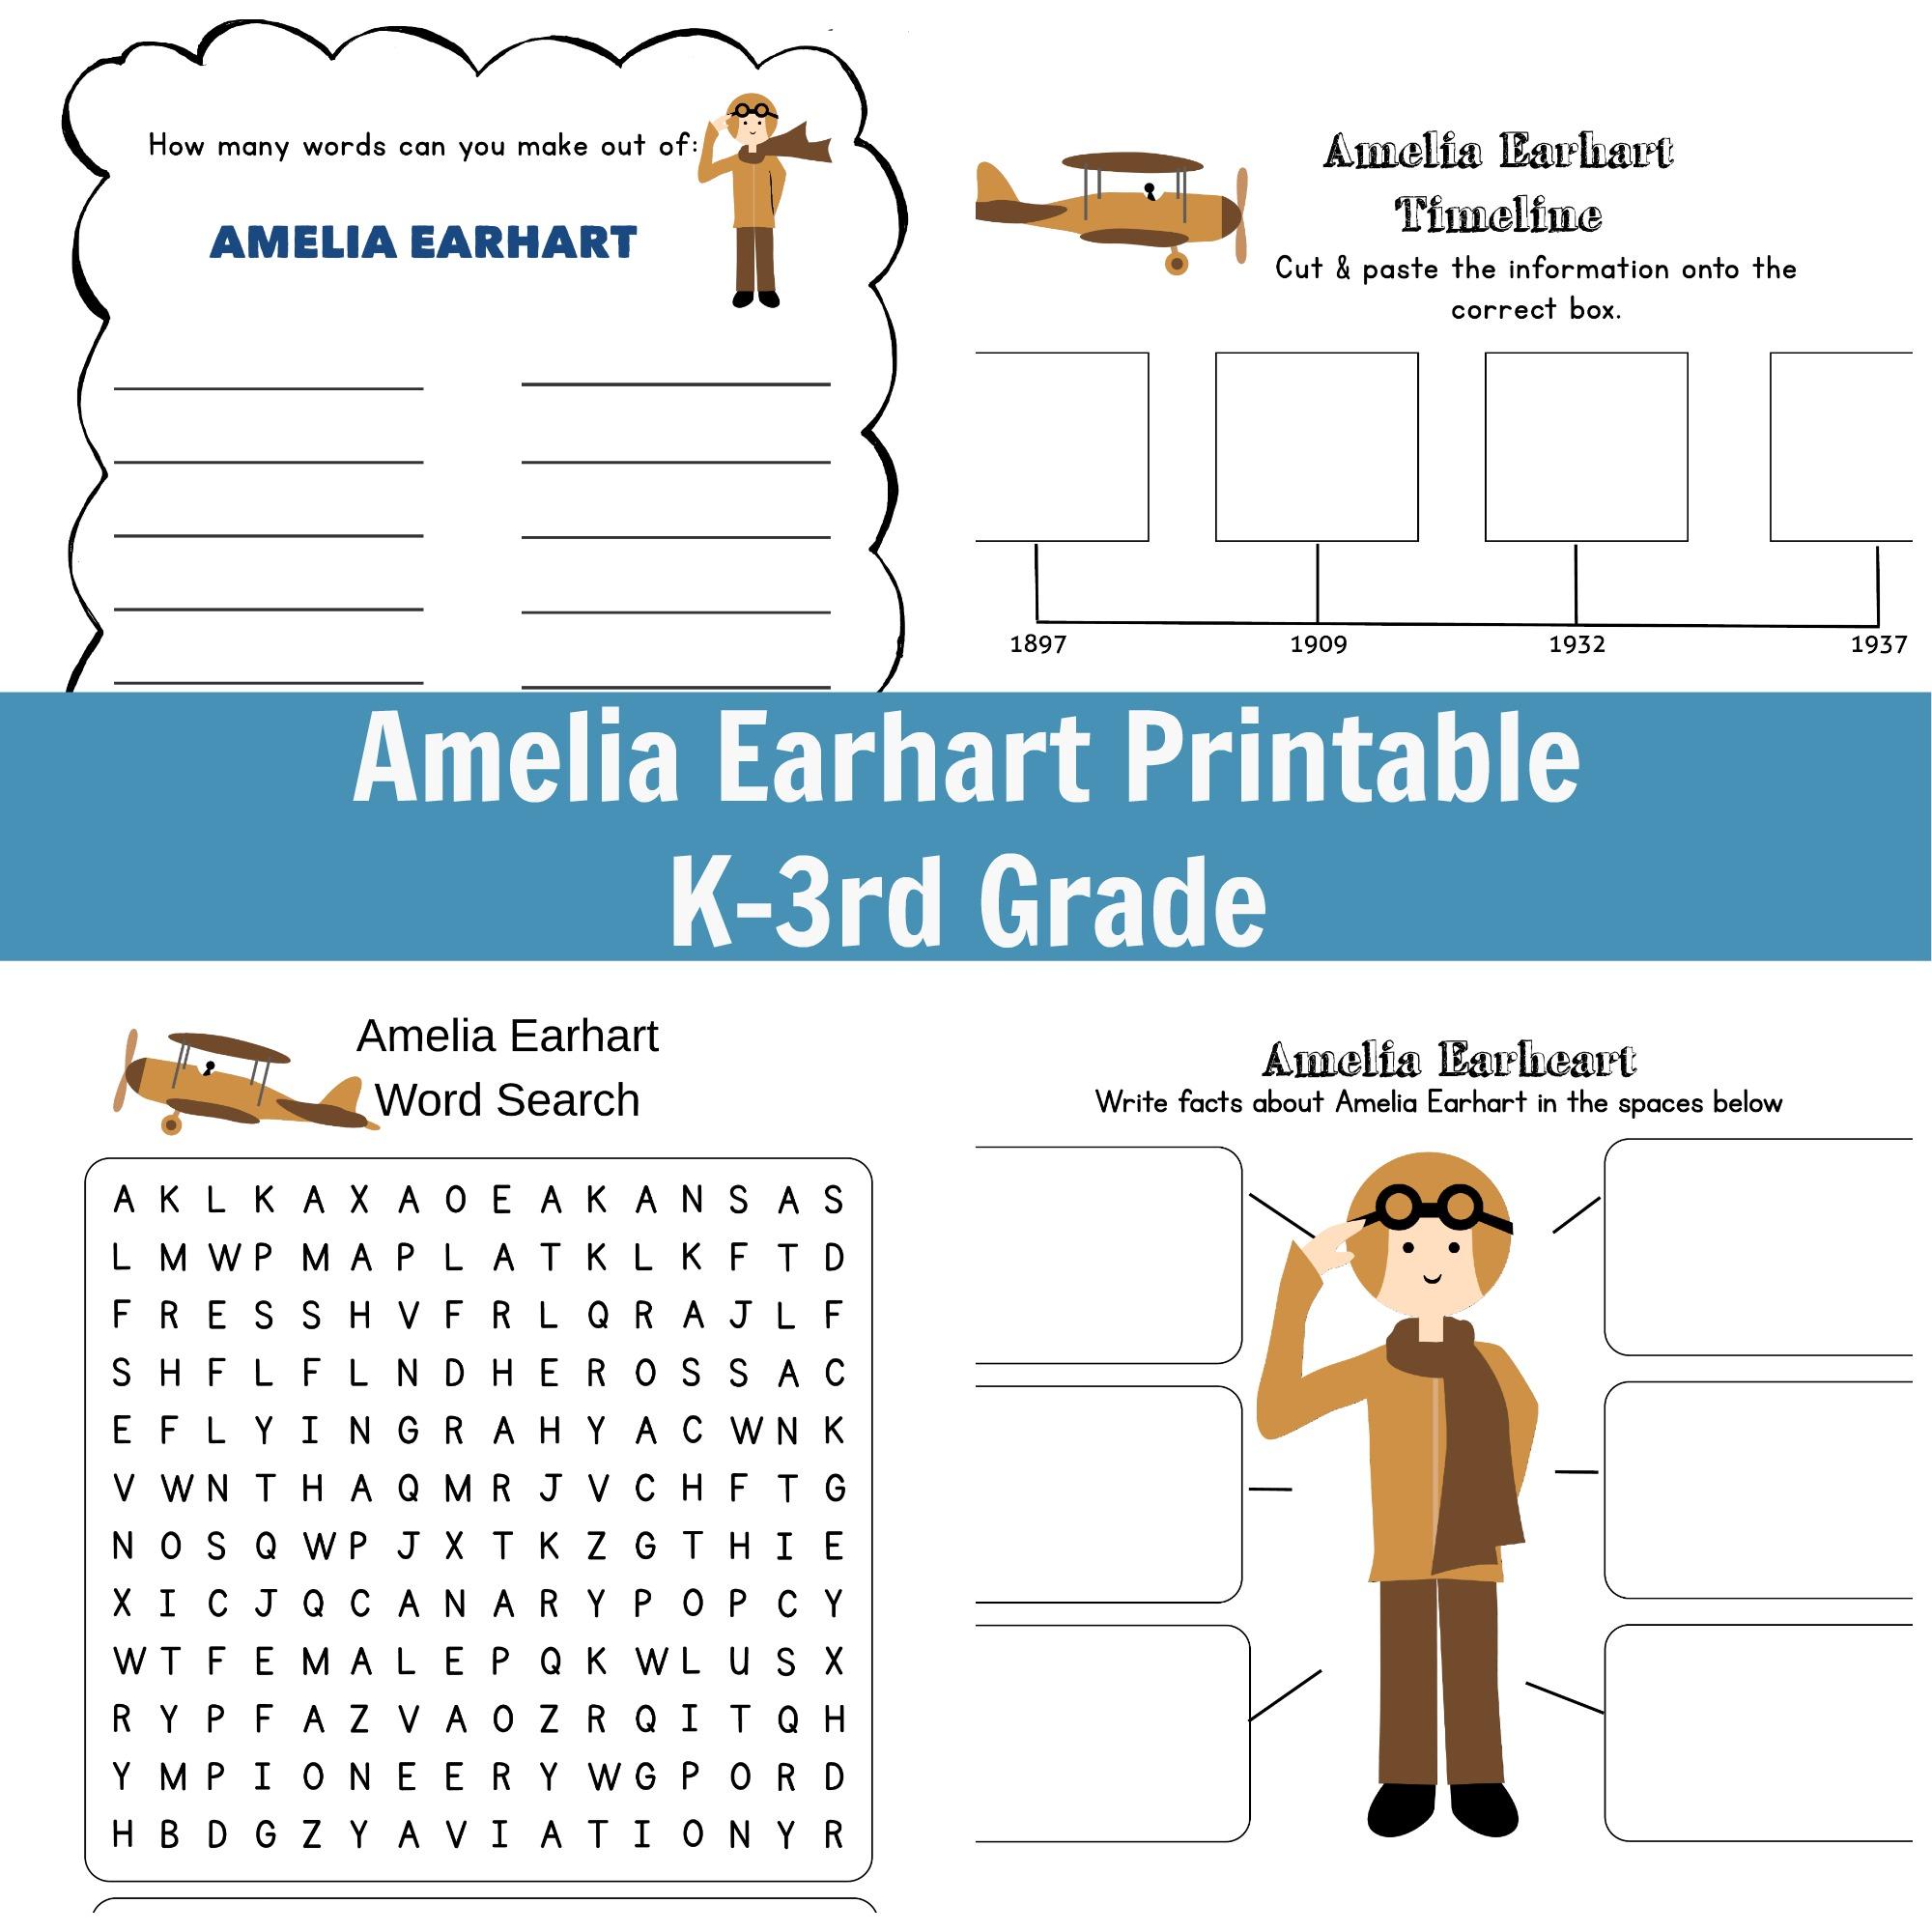 small resolution of Amelia Earhart Printable - Grades K-3